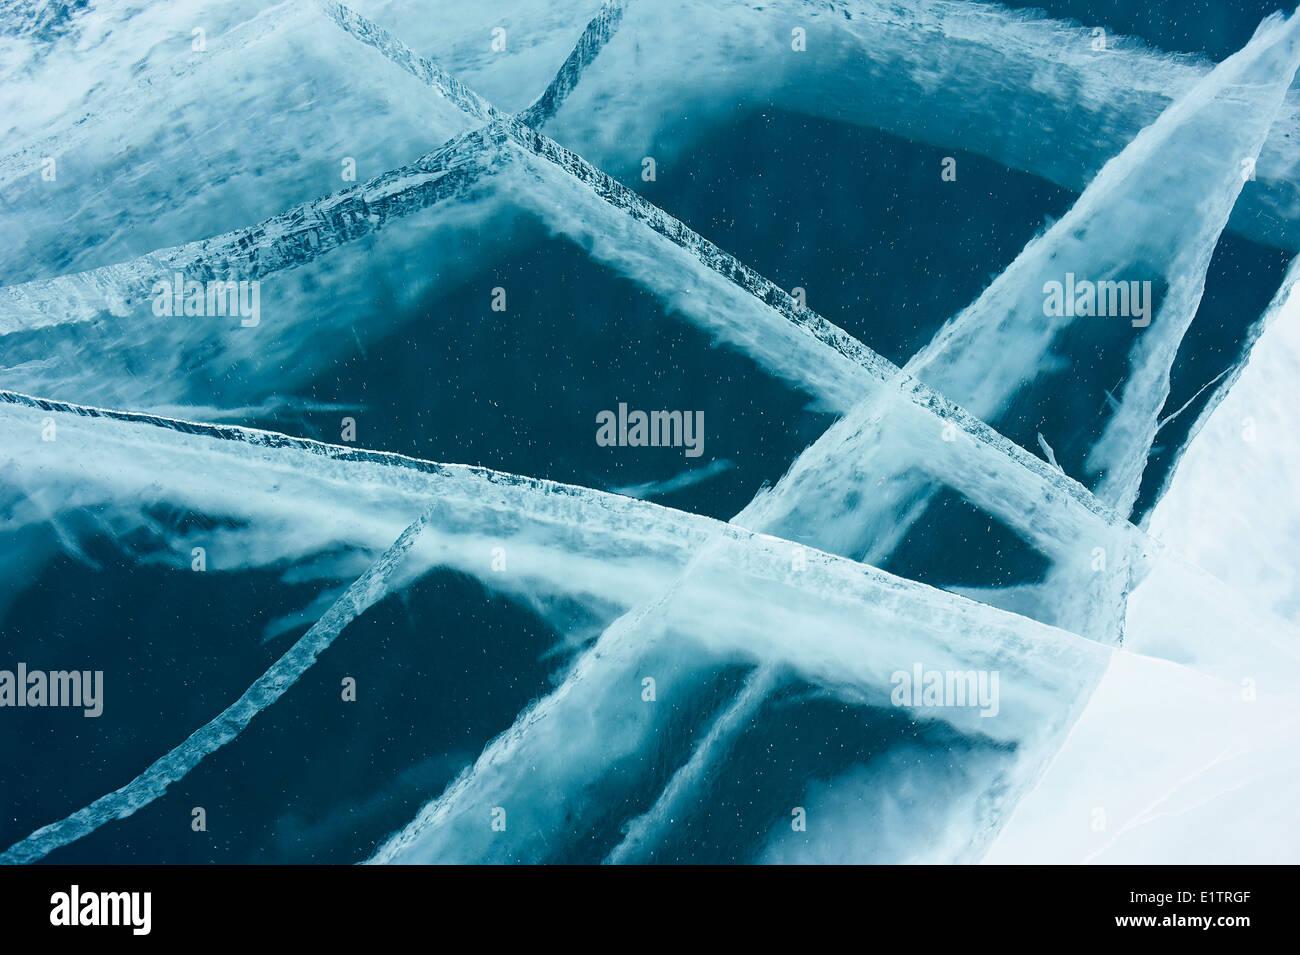 Russia, Siberia, Irkutsk oblast, Baikal lake, Maloe More (little sea), frozen lake during winter, detail - Stock Image